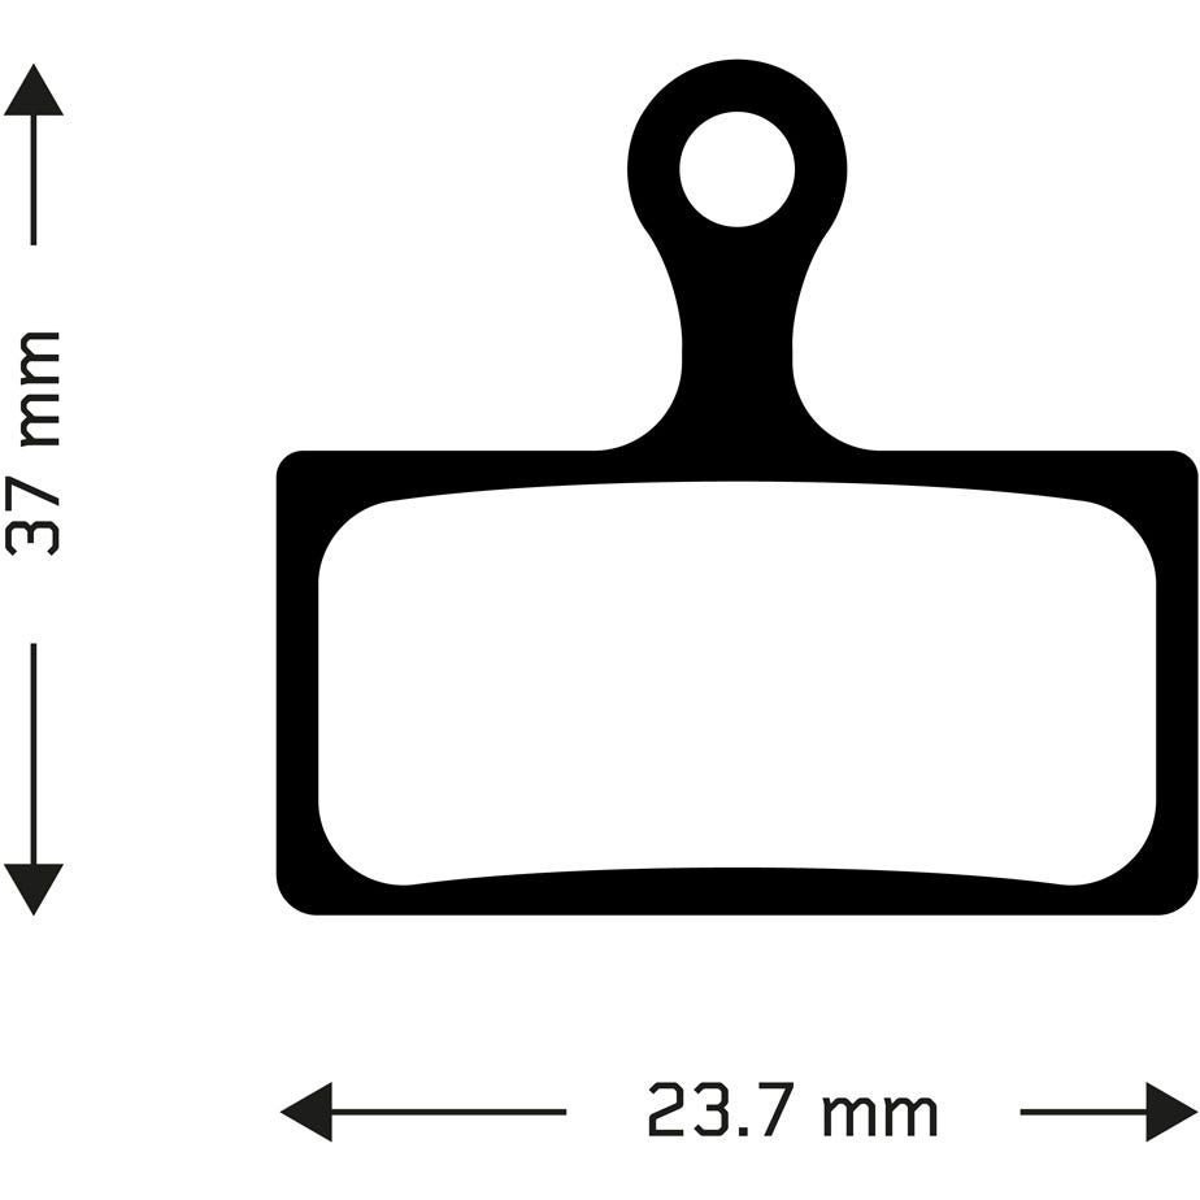 Aztec Organic disc brake pads for Shimano 2011 XTR (985 series) callipers